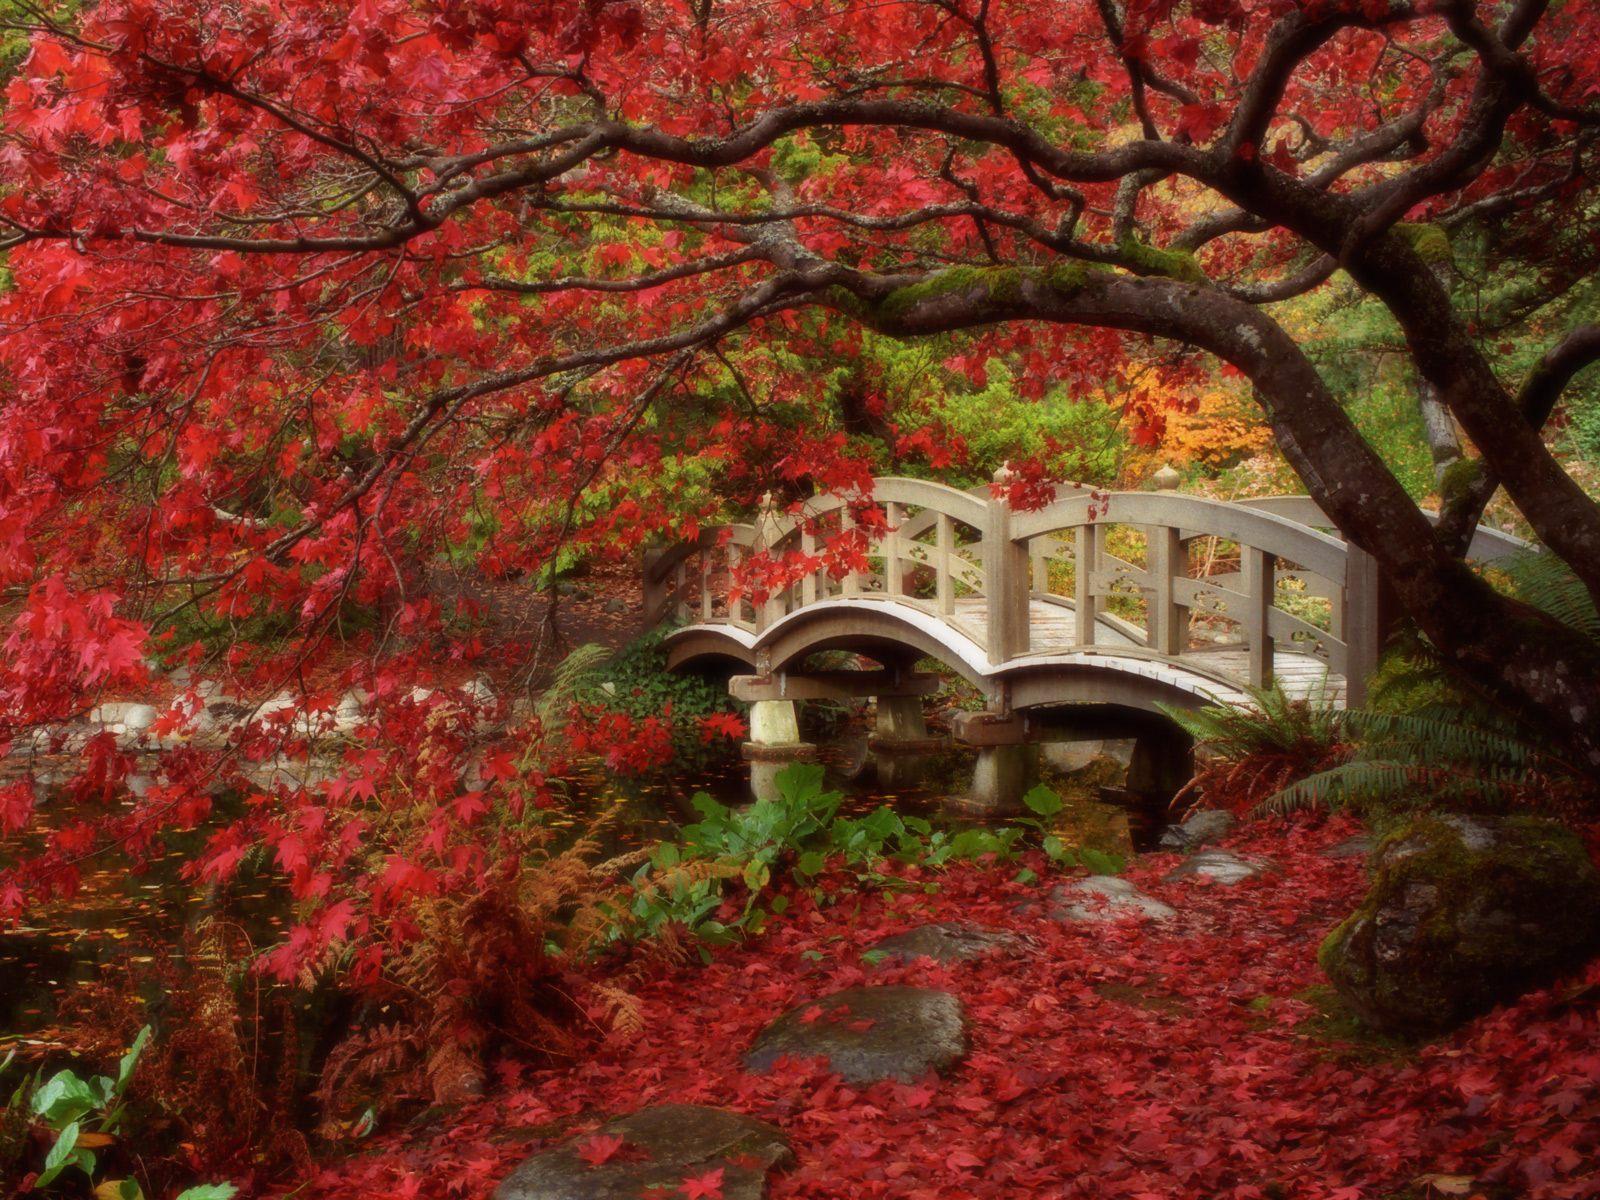 Japanese Garden British Columbia Wallpapers | HD Wallpapers